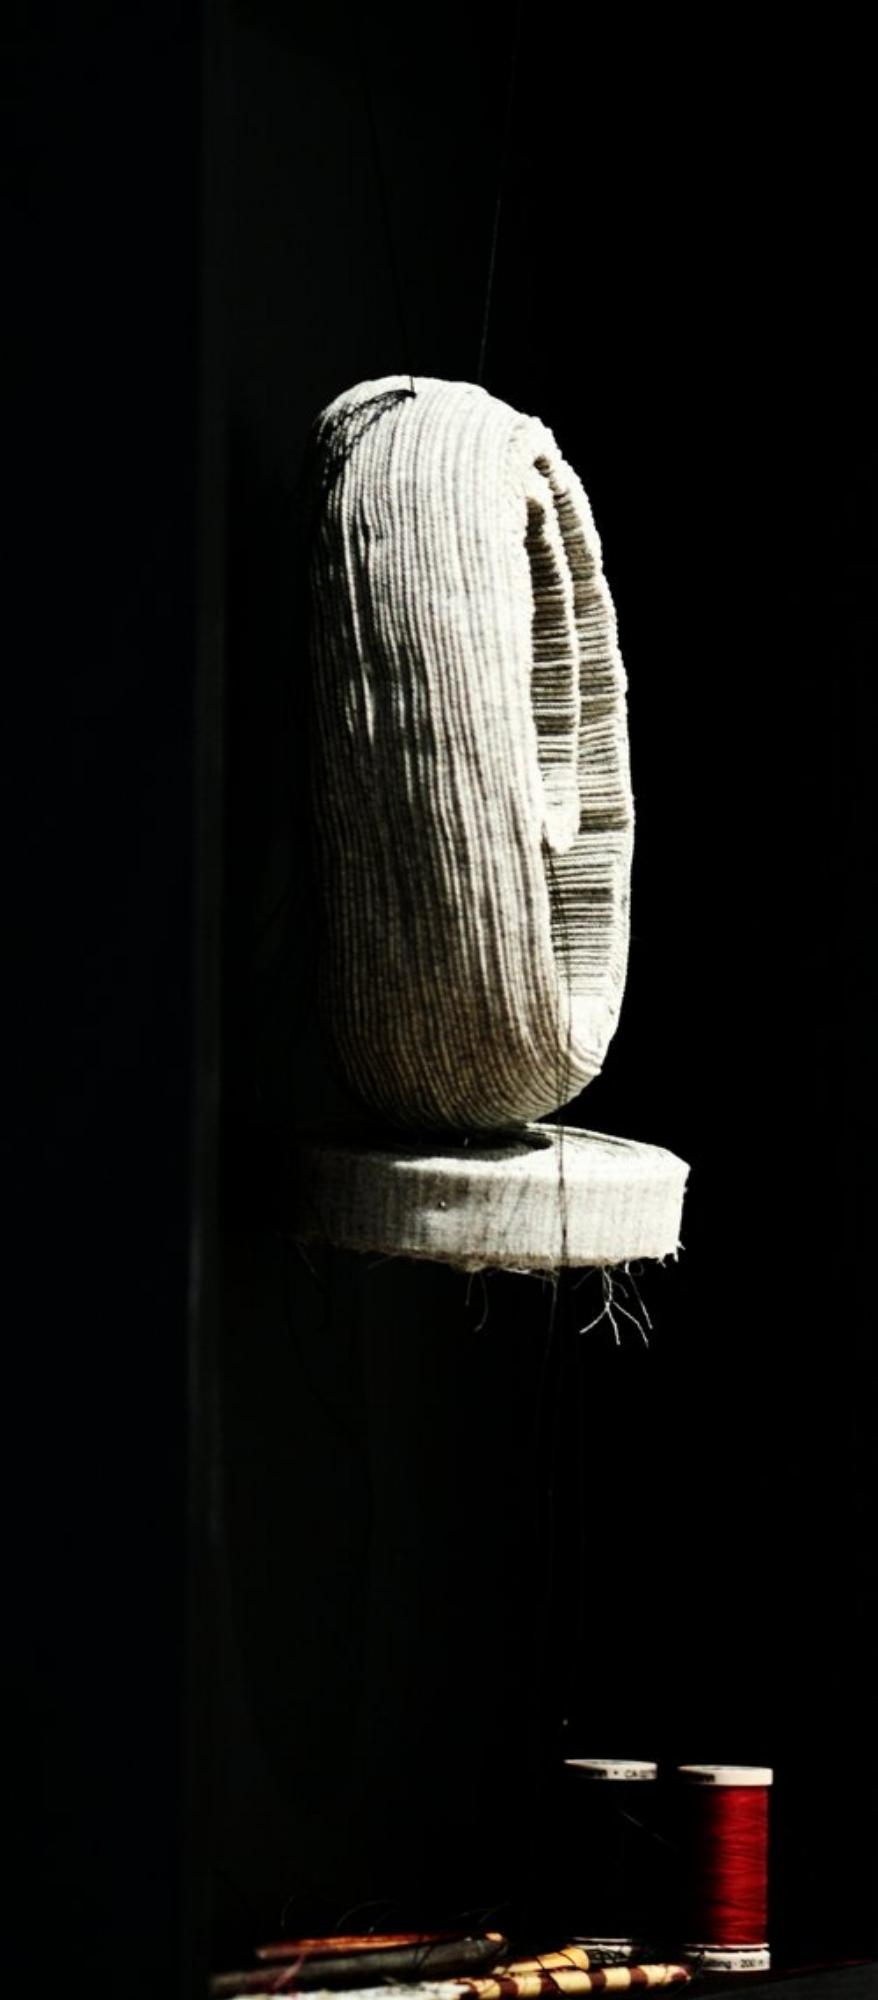 Dens of Solitude from Scribe & Stitch Series -Solo Exhibition July ,2018  ...The Night In All The Pale Windows  Was Incessantly Raging And Rebelling  Like A Suspicious Fancy,  And The Roads  Abandoned Their Ends In The Dark.  None Thought Of Love Any More  None Thought Of Glory Any More  And None  Thought Of Nothing Any More.  In The Dens Of Solitude  Vanity Was Born,  -------  شب در تمام پنجره های پریده رنگ  مانند یک تصور مشکوک پیوسته در تراکم و طغیان بود  و راهها ادامهء خود را در تیرگی رها کردند  دیگر کسی به عشق نیندیشید  دیگر کسی به فتح نیندیشید  و هیچکس  دیگر به هیچ چیز نیندیشید  در غارهای تنهائی  بیهودگی به دنیا آمد  (آیه های زمینی - فروغ فرخزاد)